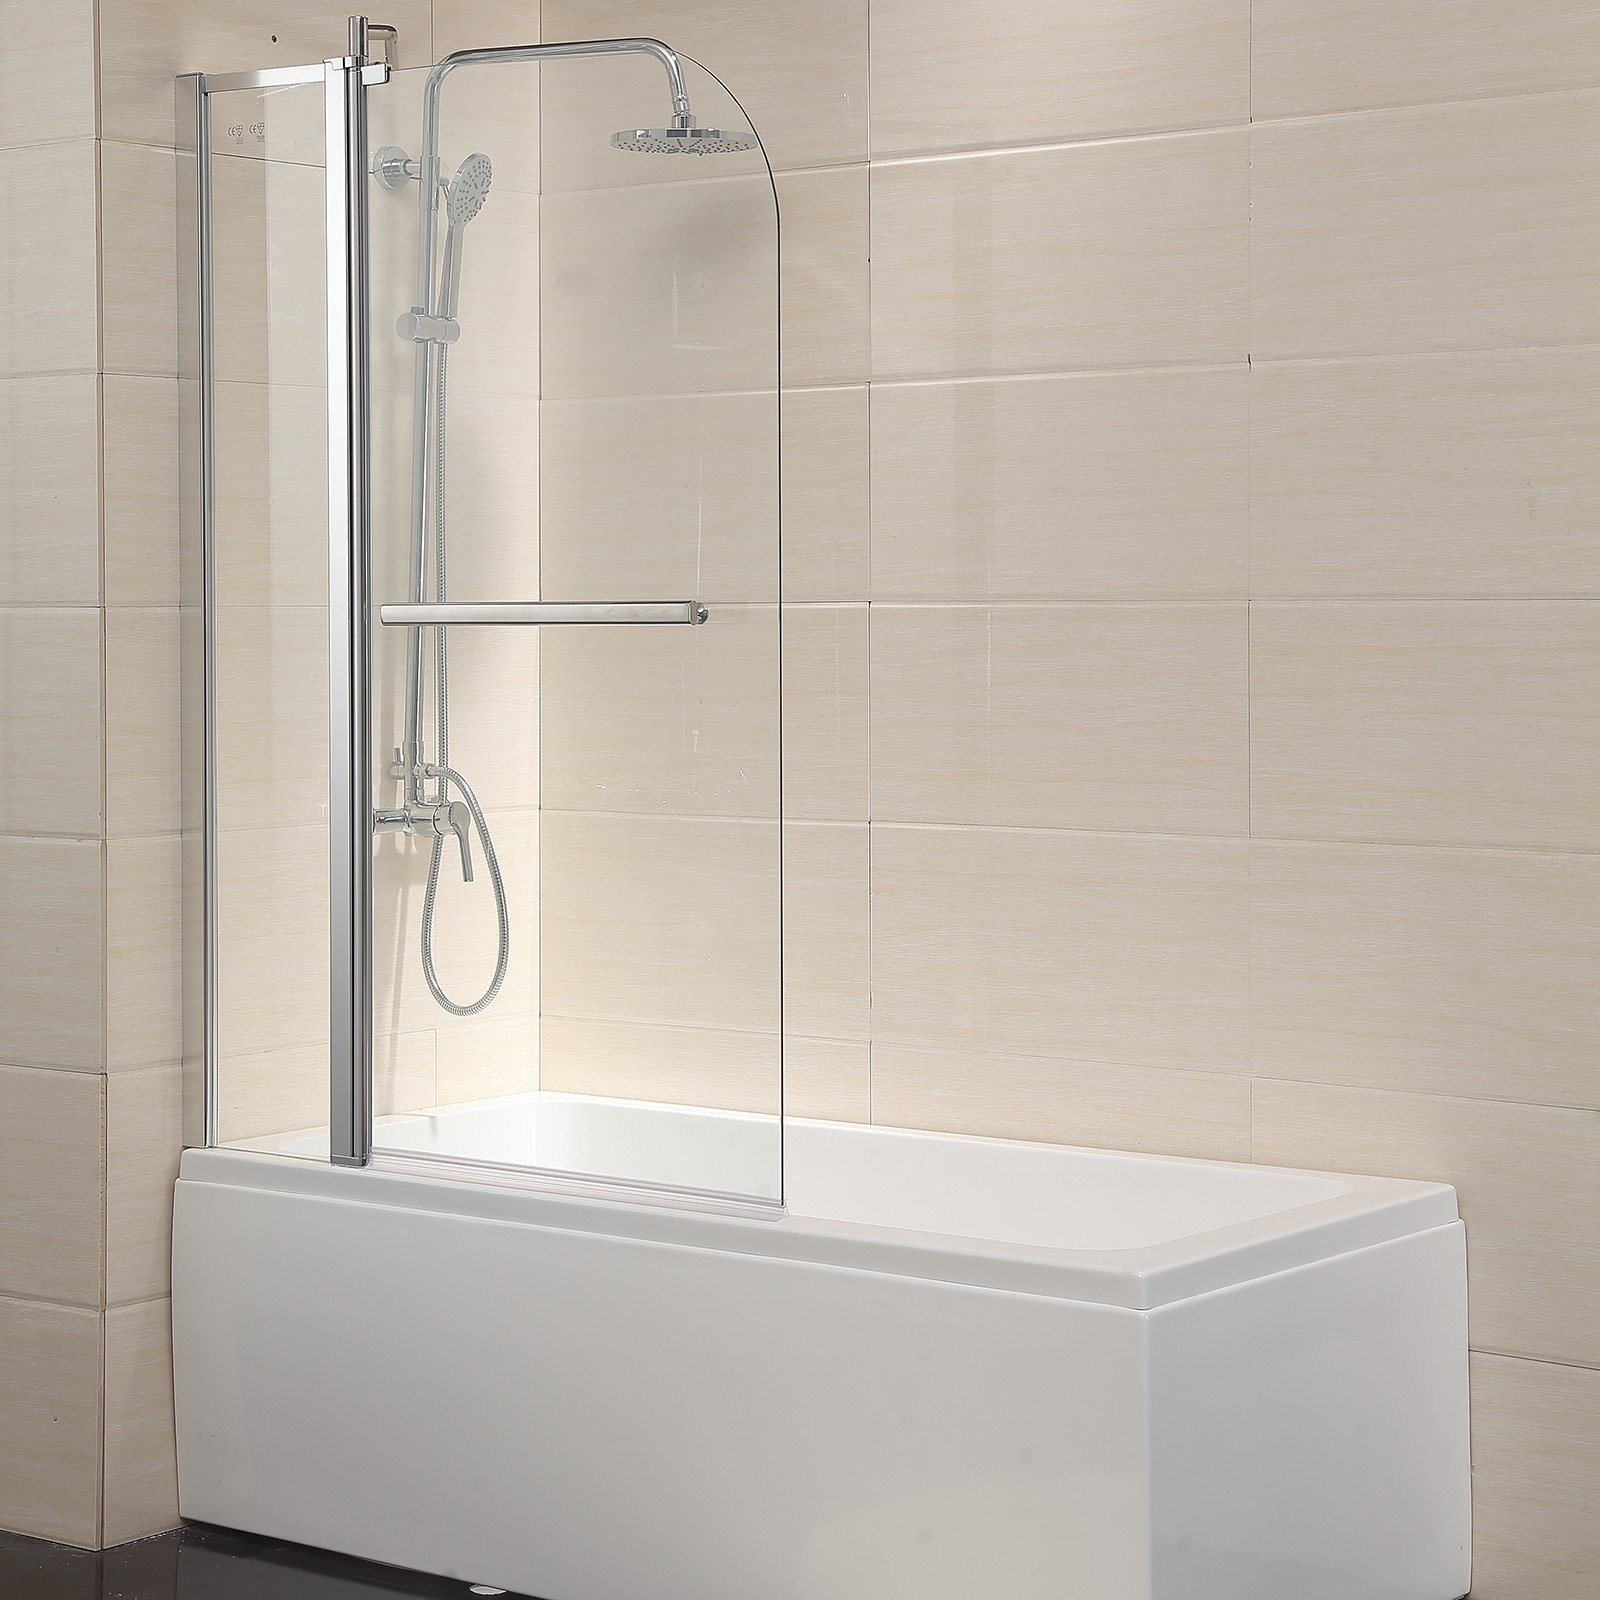 Cheap Glass Door For Bathtub Find Glass Door For Bathtub Deals On